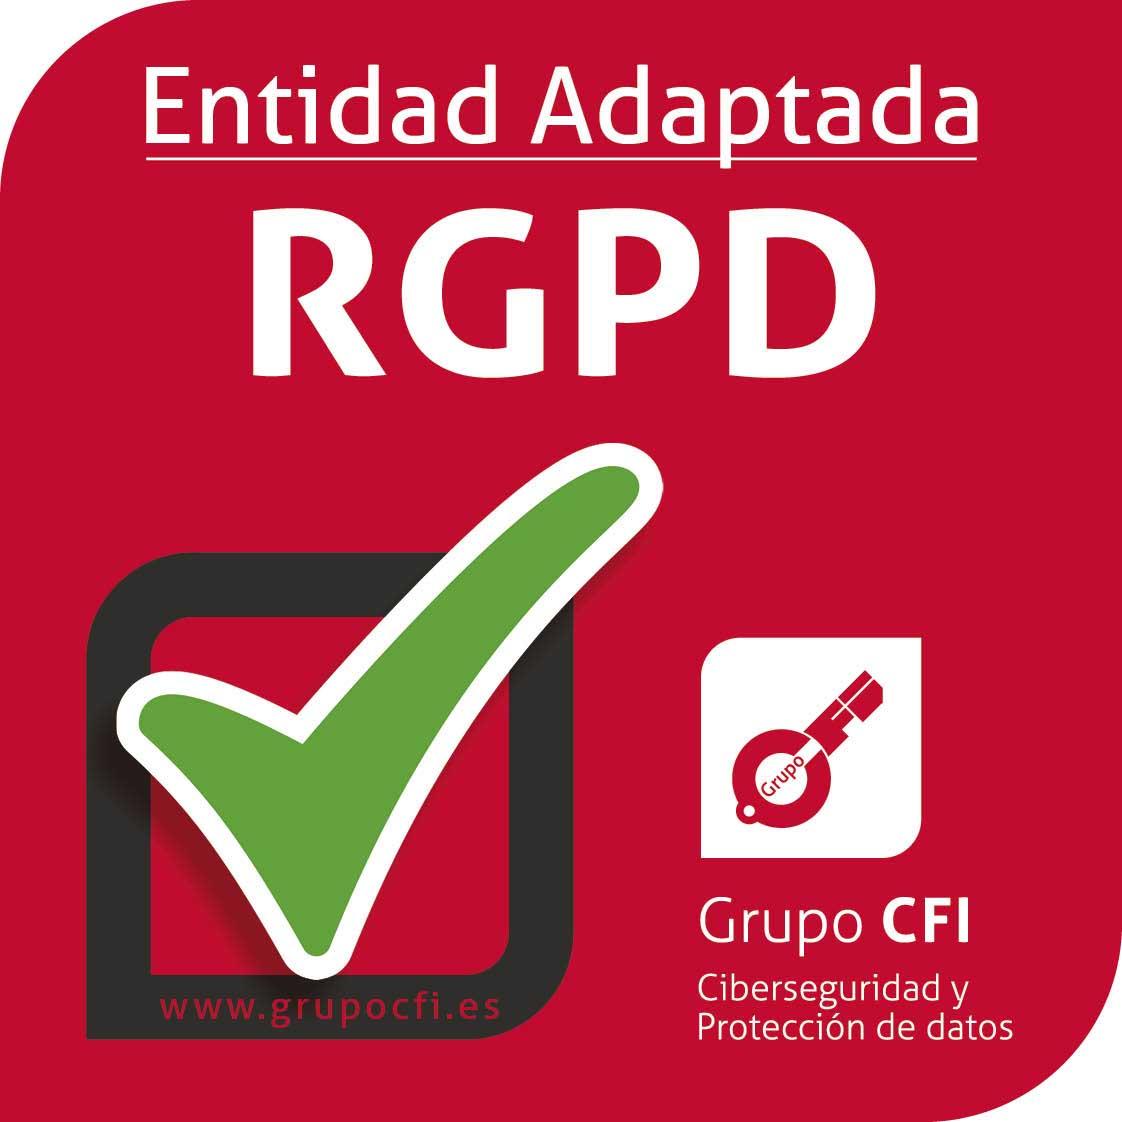 Entidad Adaptatada RGPD